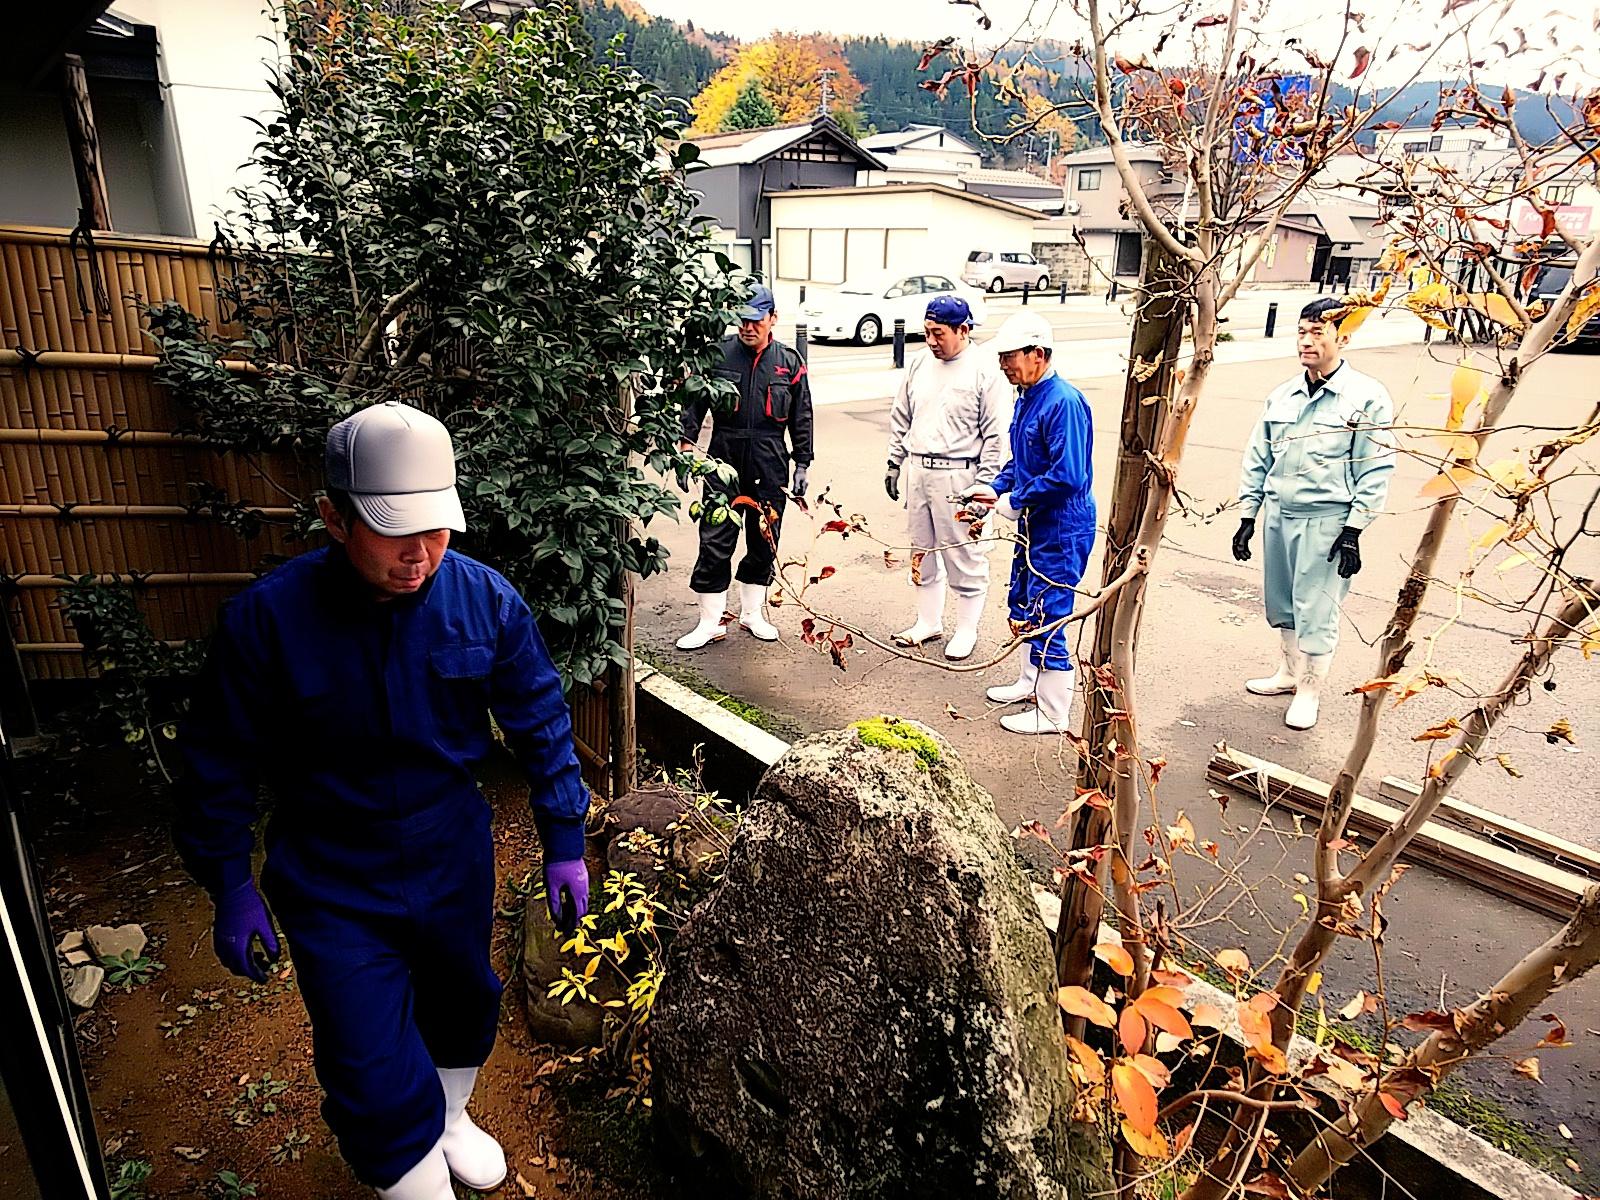 http://www.fukukomachi.com/blog/photo/C360_2018-11-21-14-44-38-822.jpg